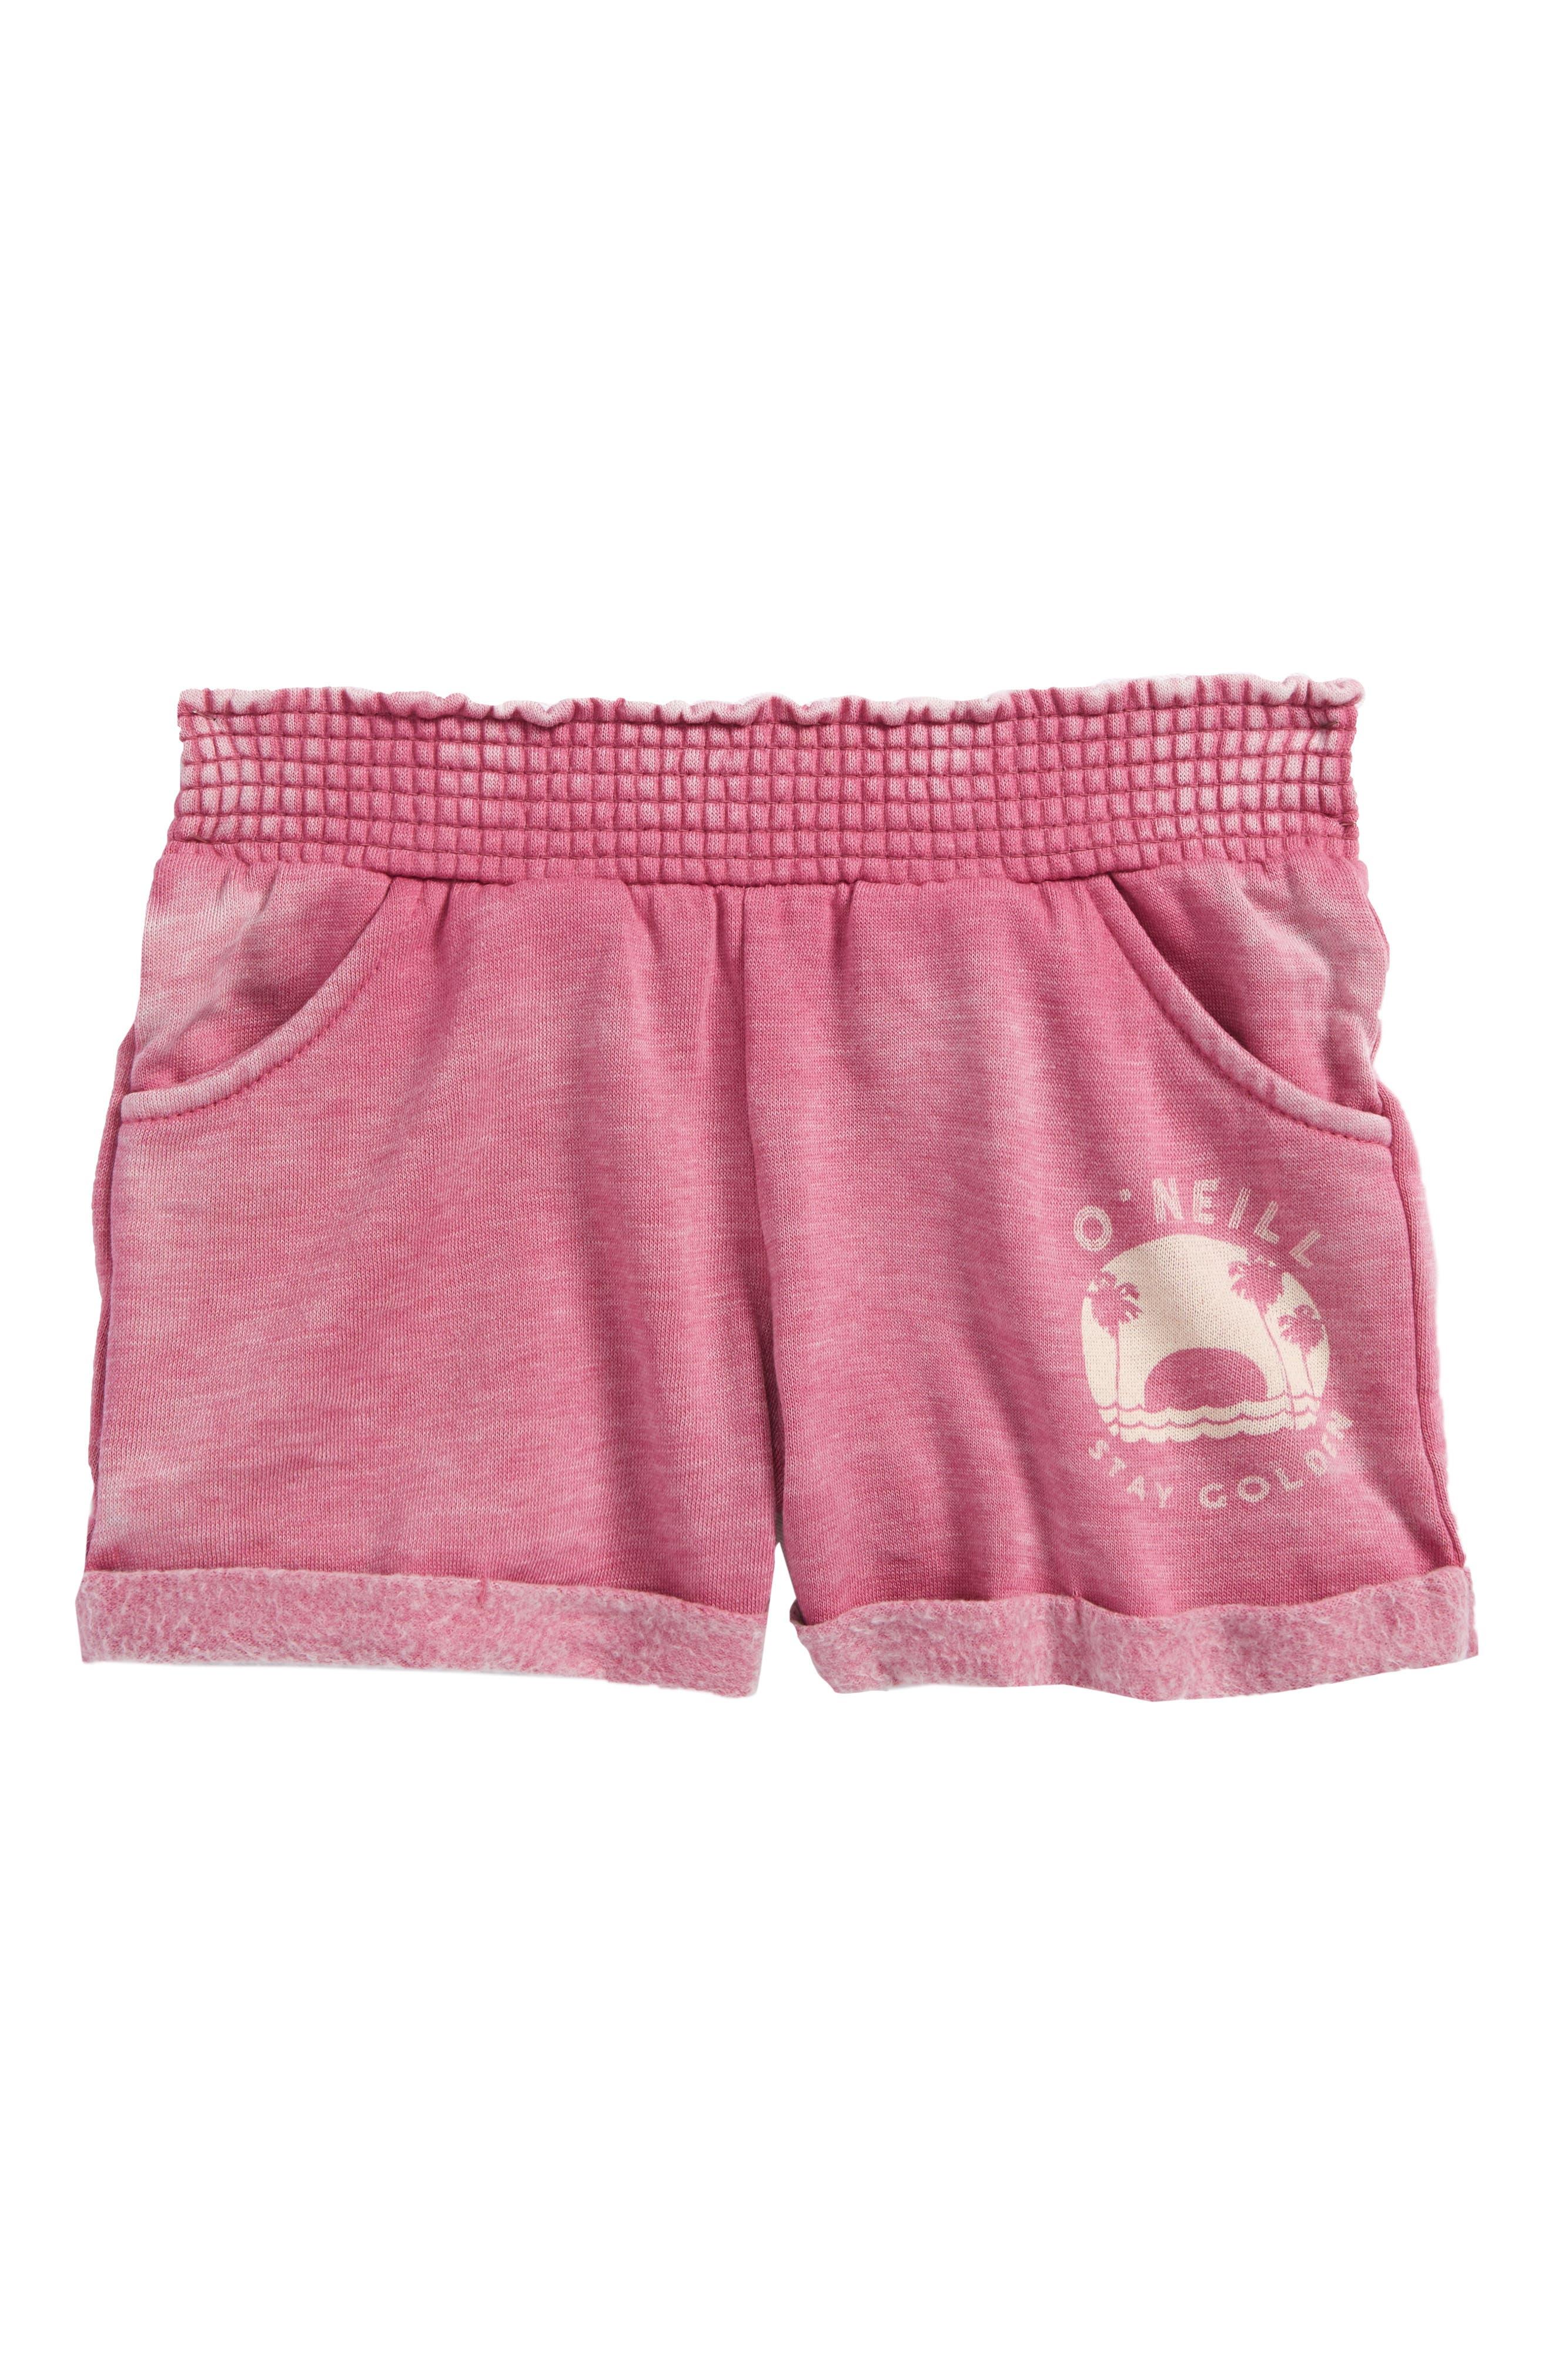 Horizon Shorts,                         Main,                         color, WILD FLOWER